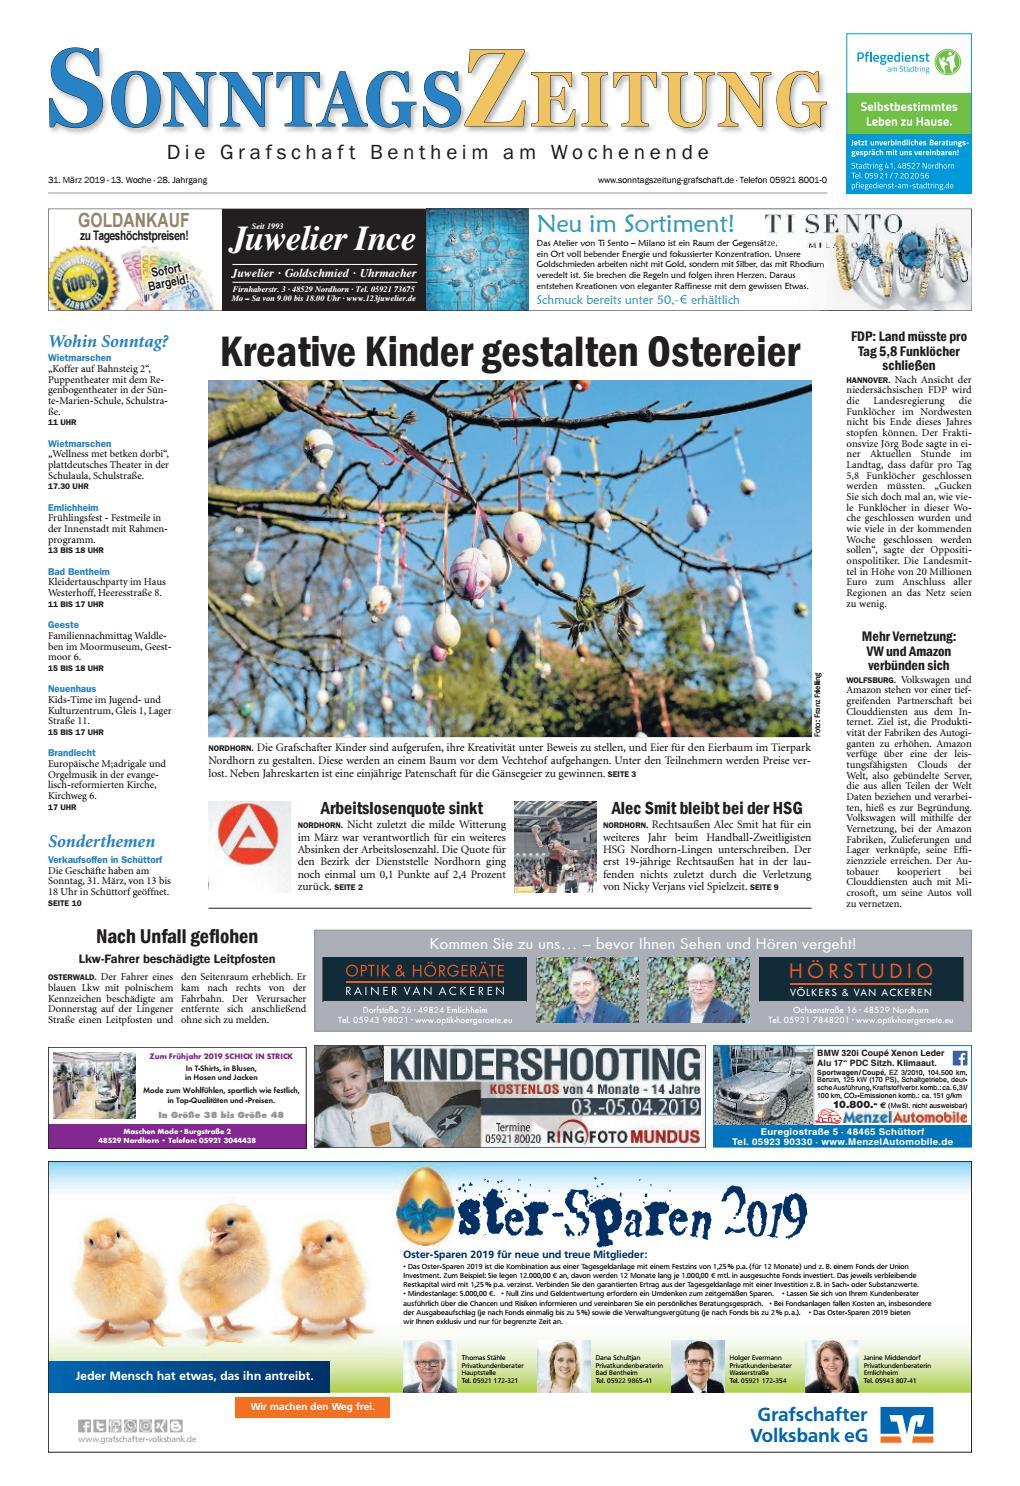 Carolin Kebekus Tickets ems Preisnachlass Lingen